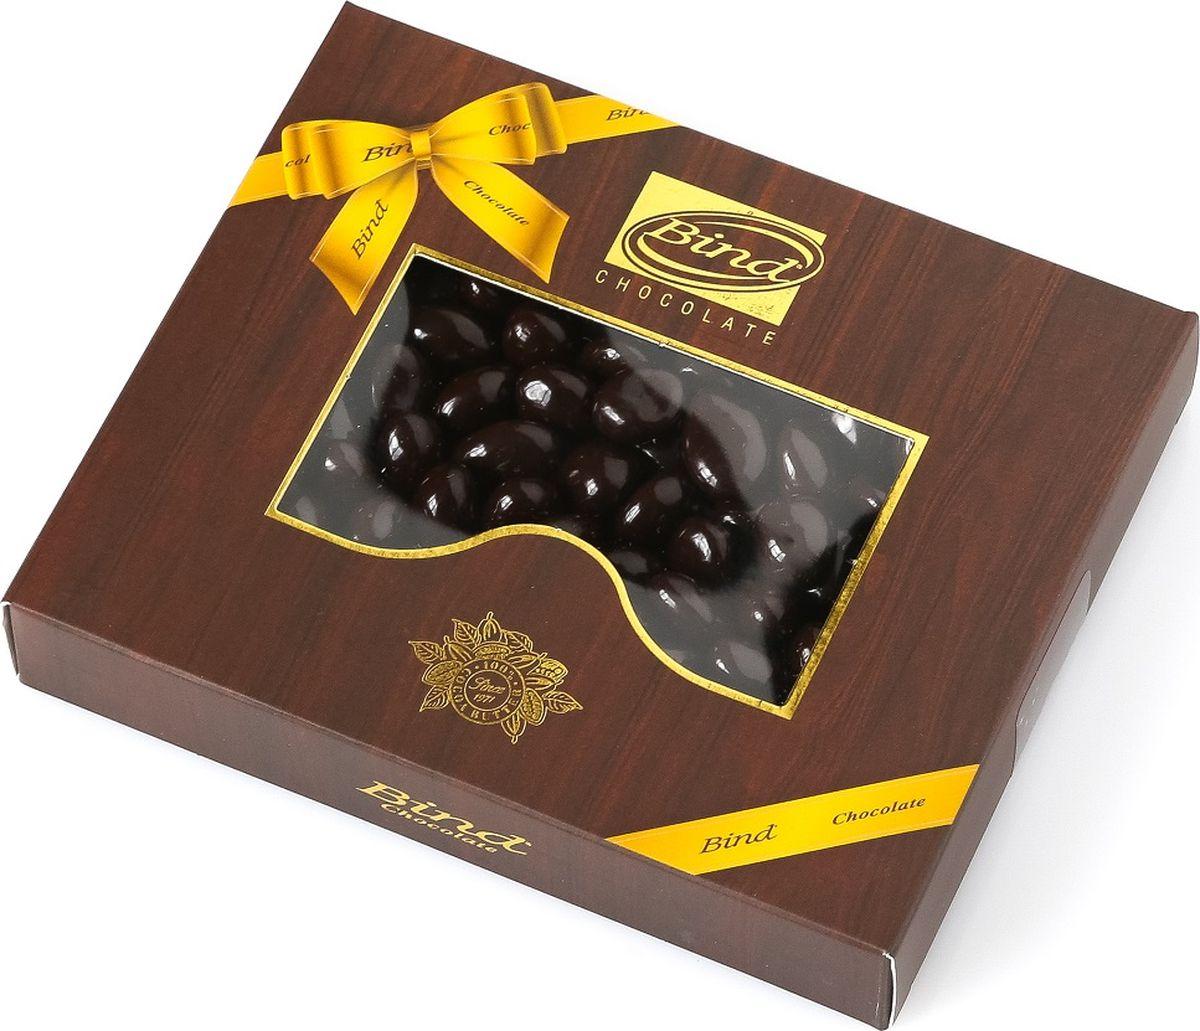 Bind изюм покрытый темным шоколадом драже, 100 г skittles фрукты драже в сахарной глазури 12 пачек по 38 г